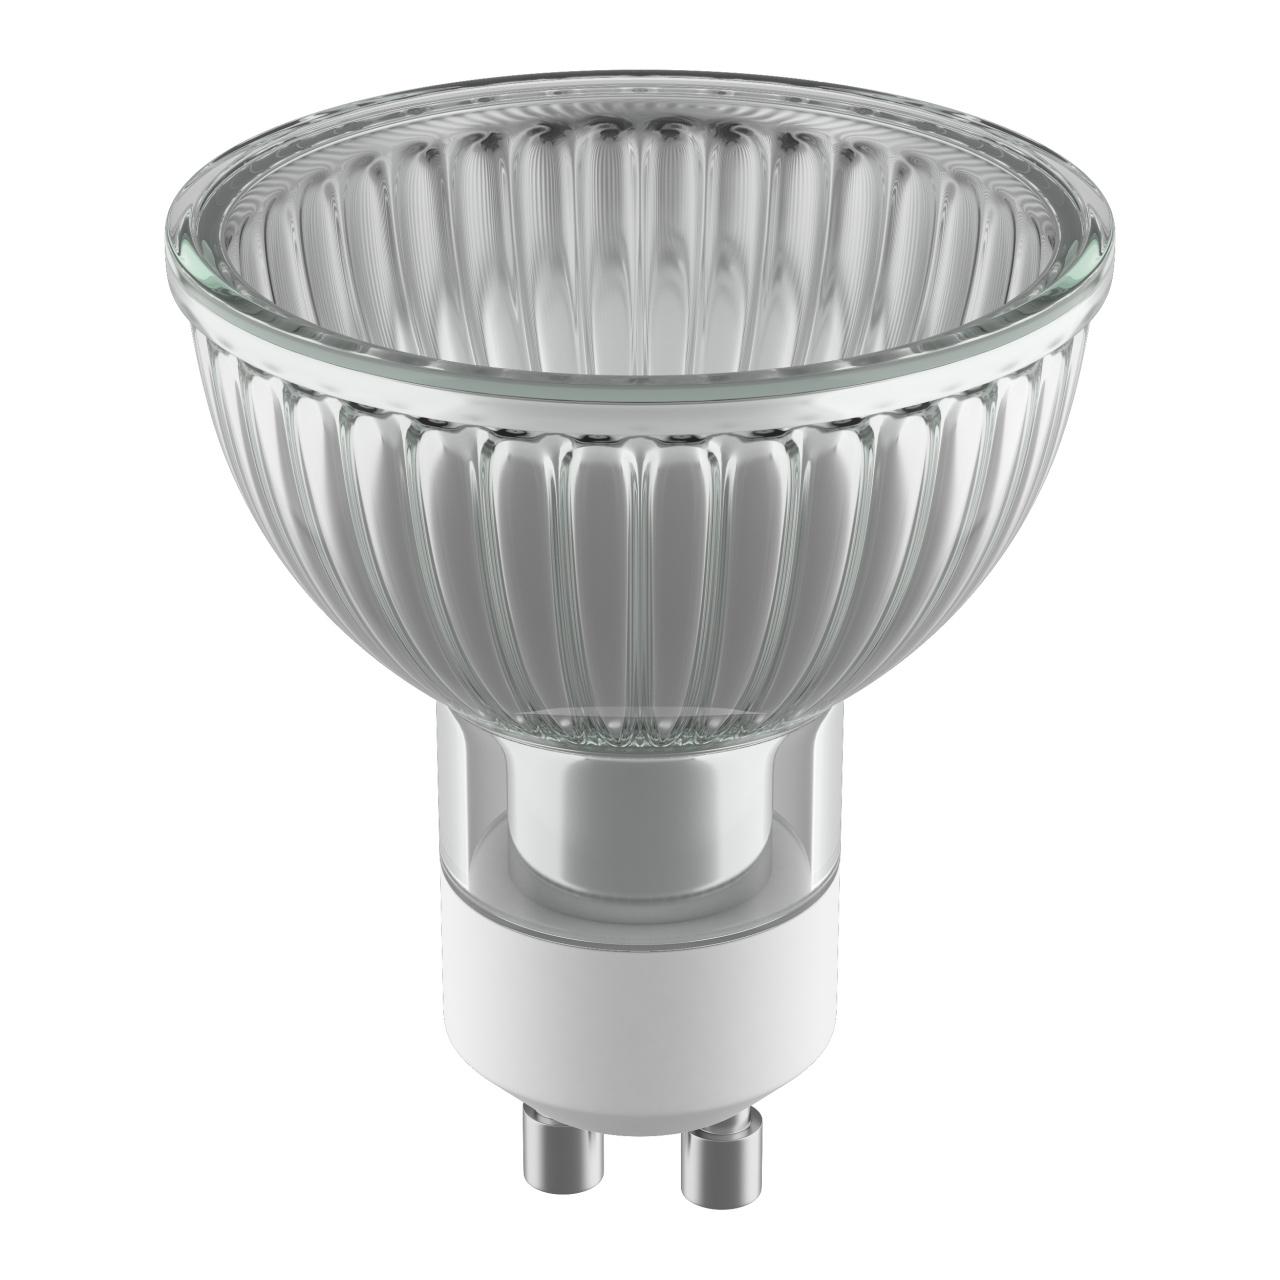 Лампа HAL 220V HP16 GU10 35W 40G ALU RA100 2800K 2000H DIMM Lightstar 922705